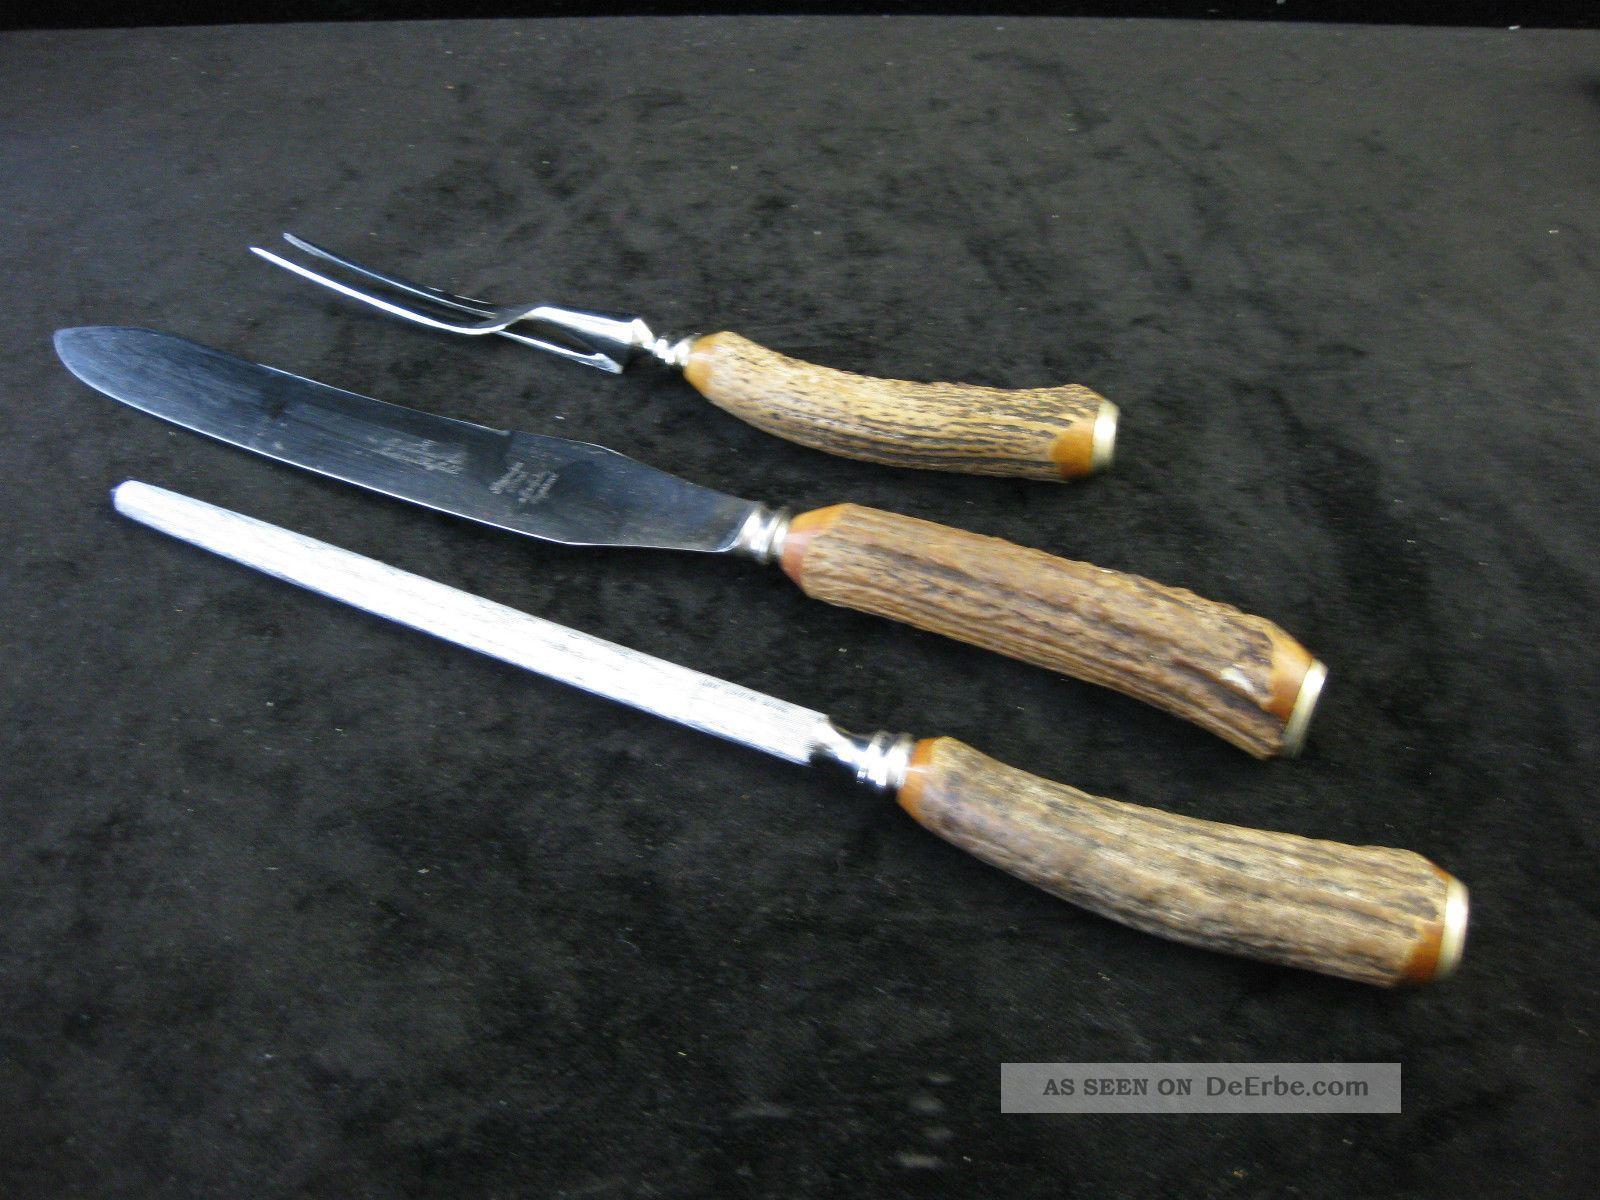 Altes Tranchierbesteck Besteck Messer Jagd Horngriff / Sheffield - England Jagd & Fischen Bild